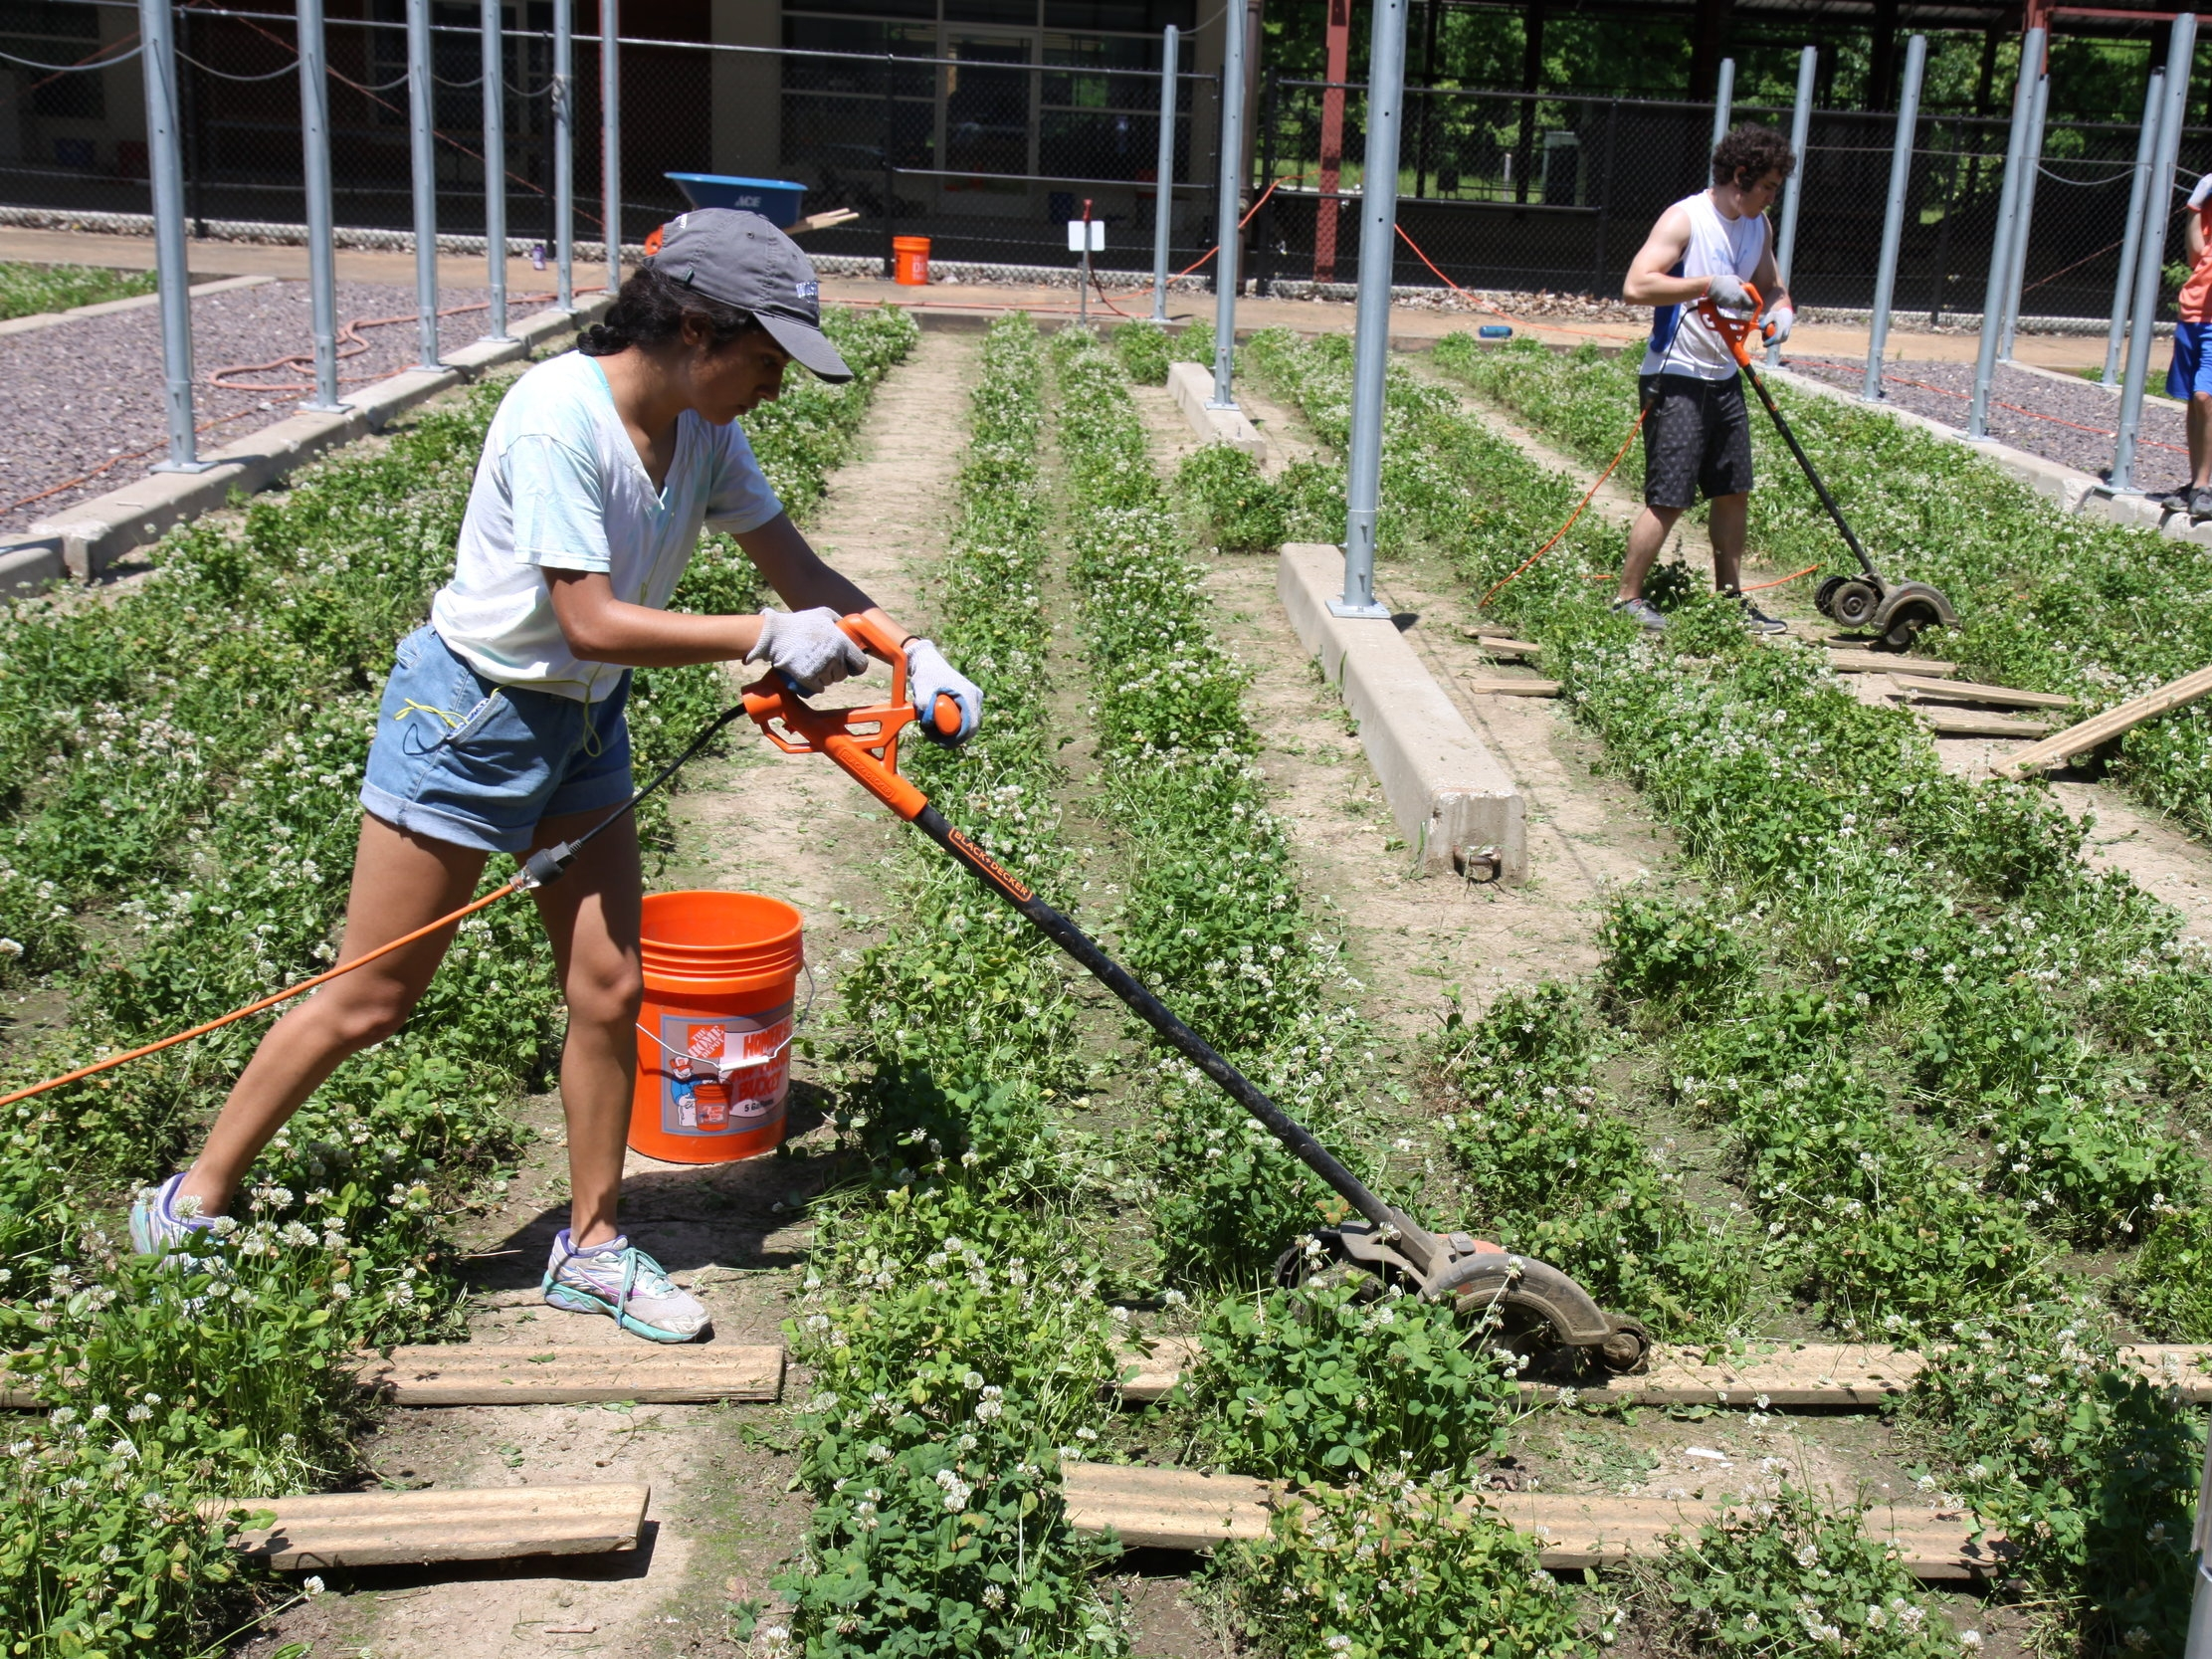 Maya using an edger to trim around experimental clover plots